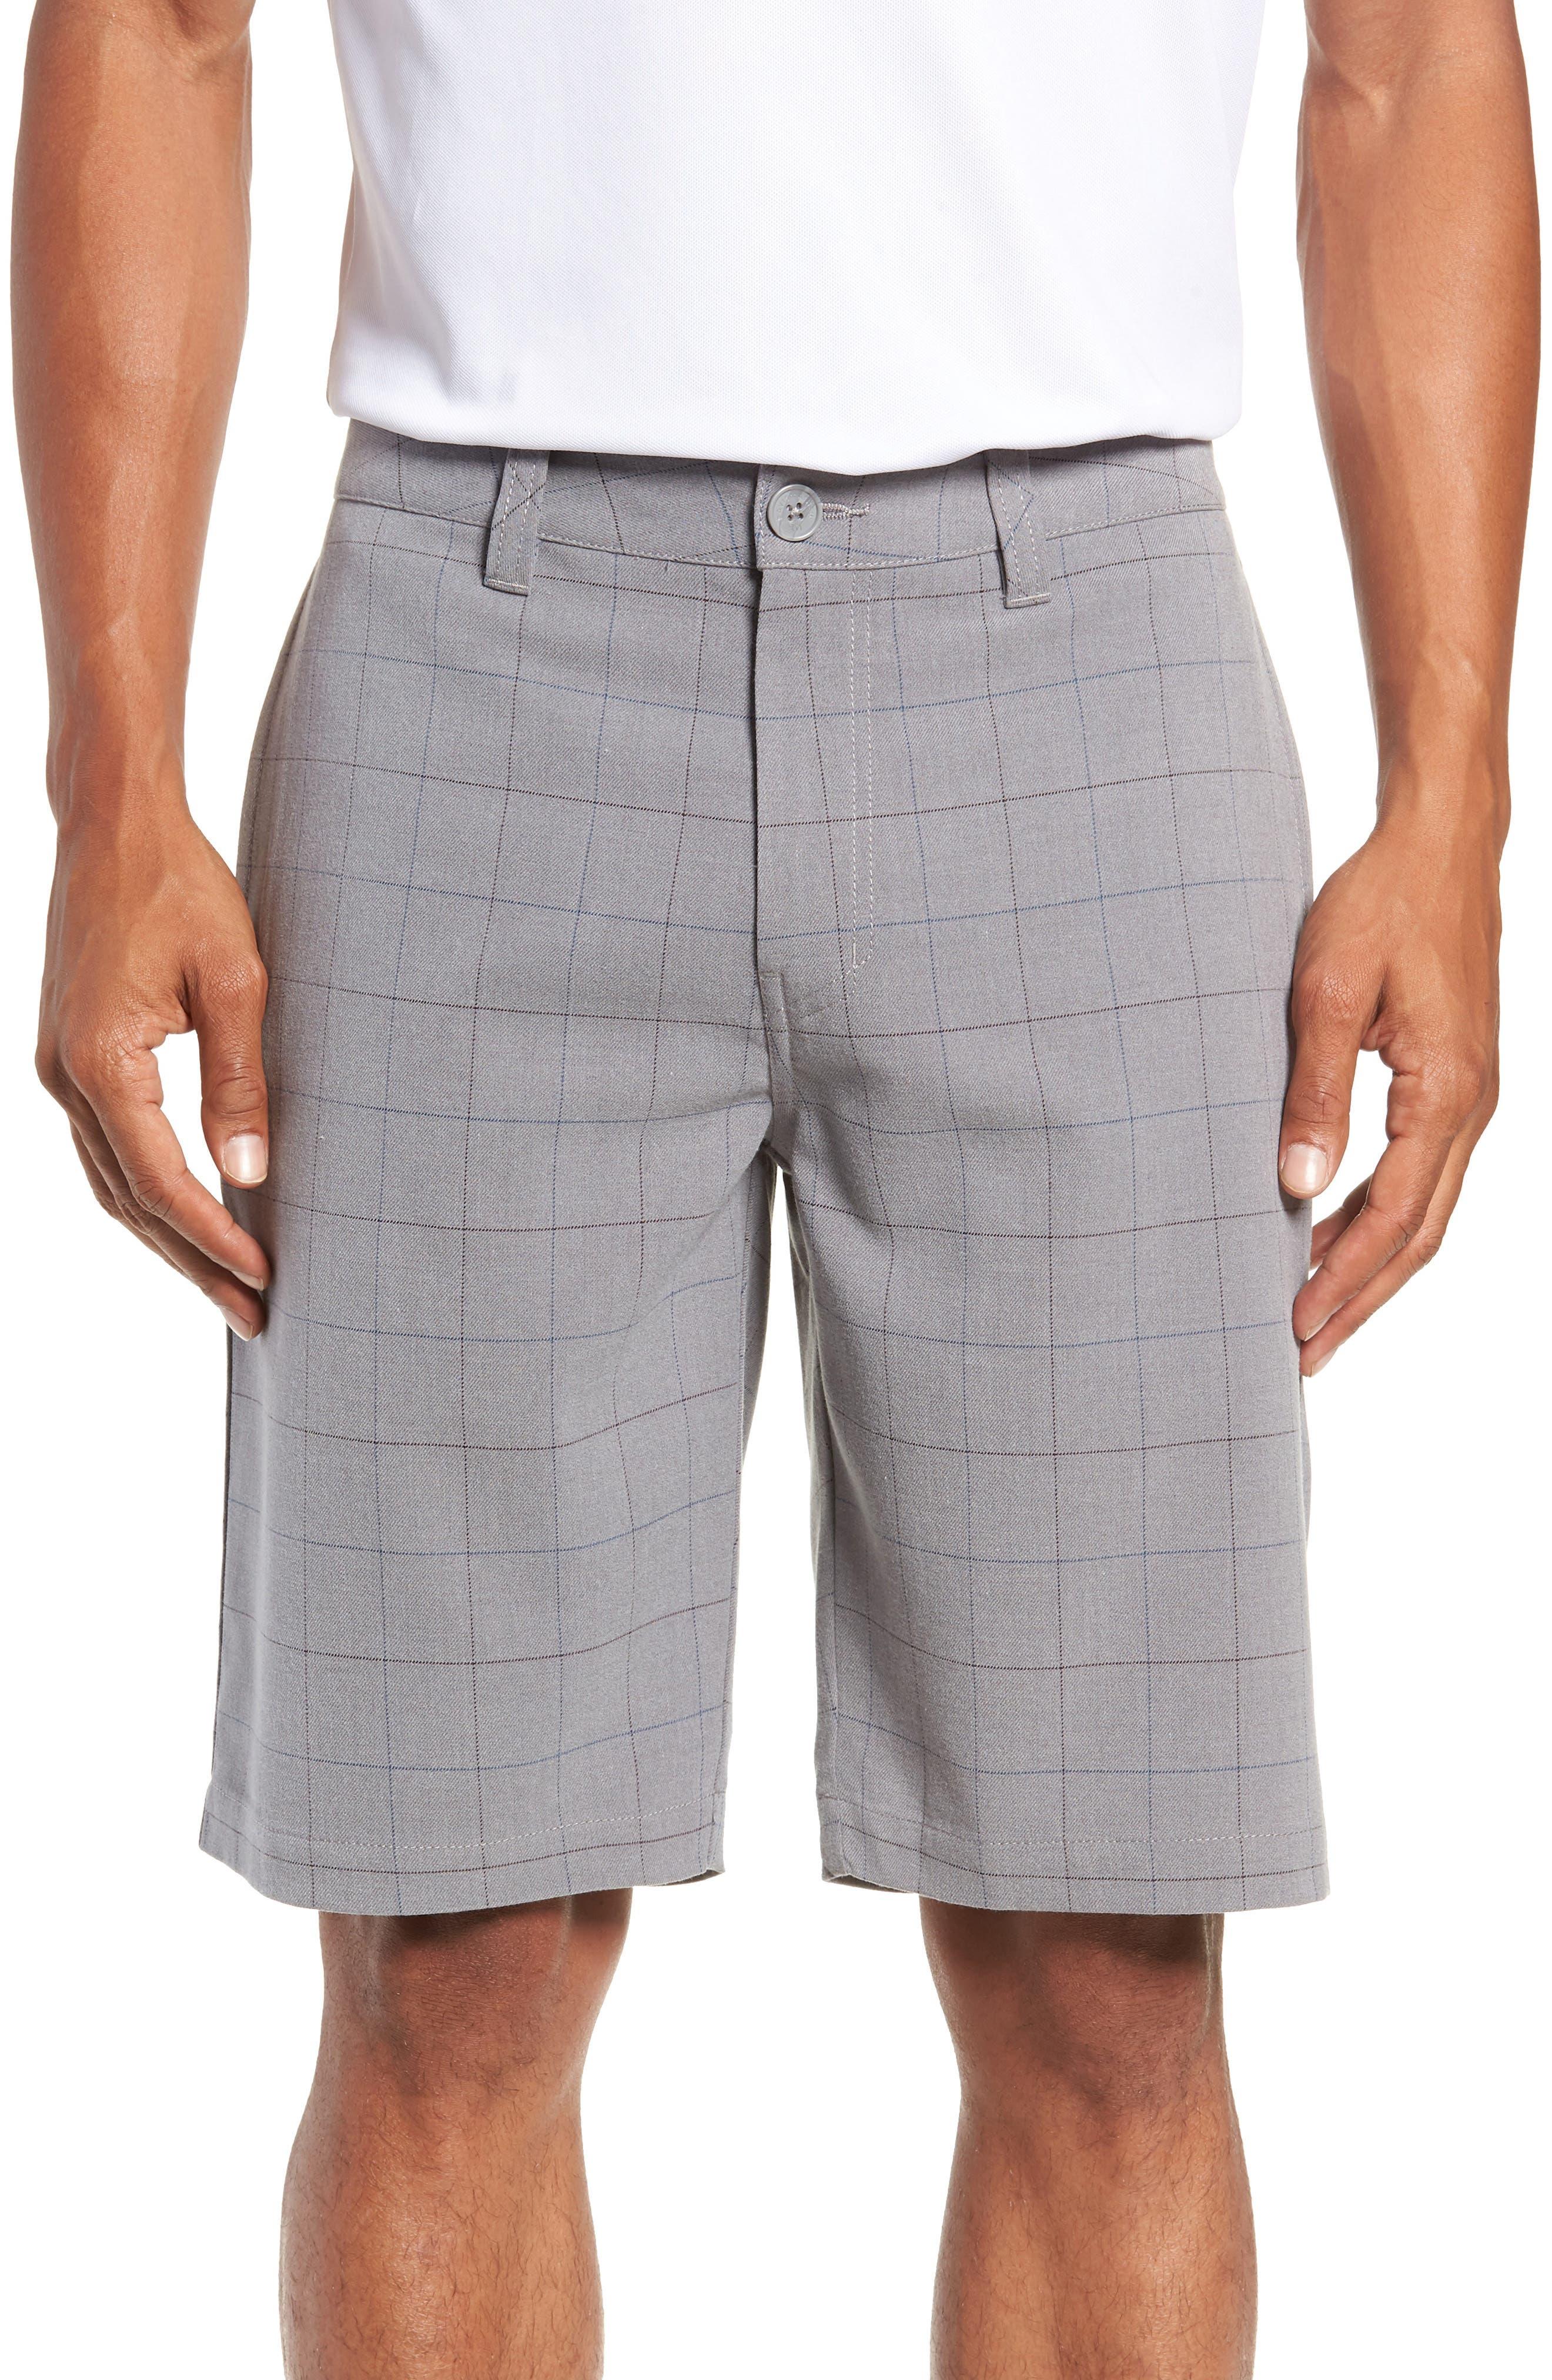 Rickles Regular Fit Shorts,                         Main,                         color, 020